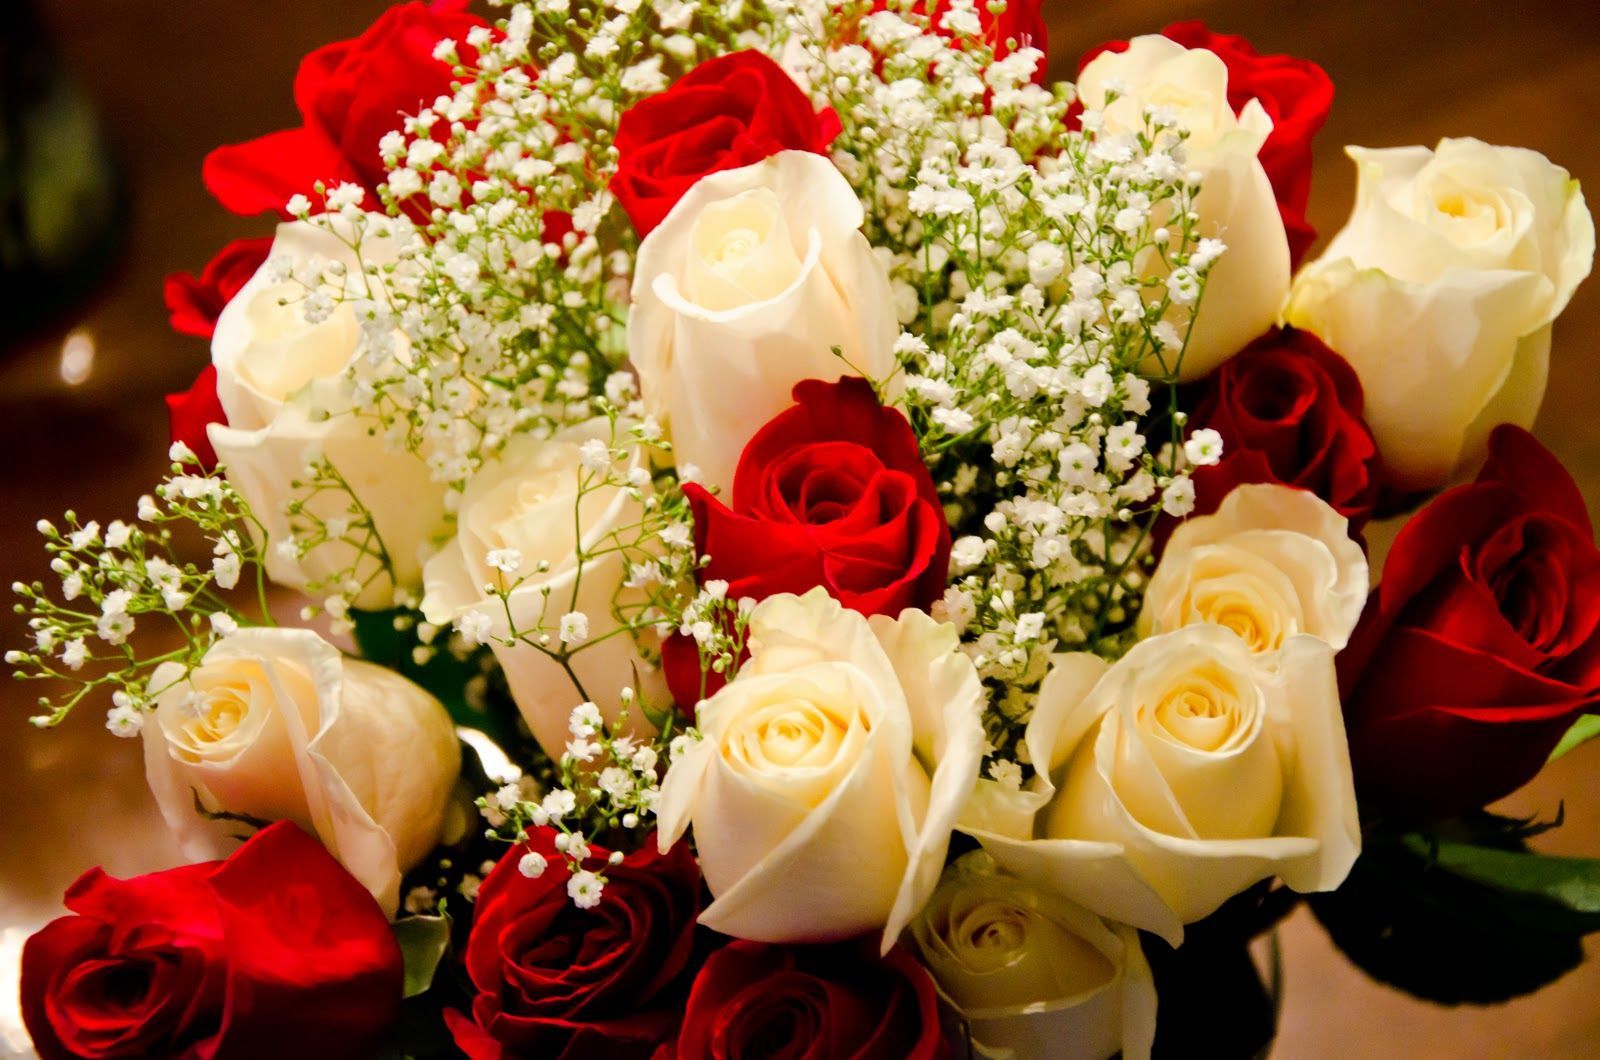 Happy Birthday To You Flowers 9 Happy Birthday